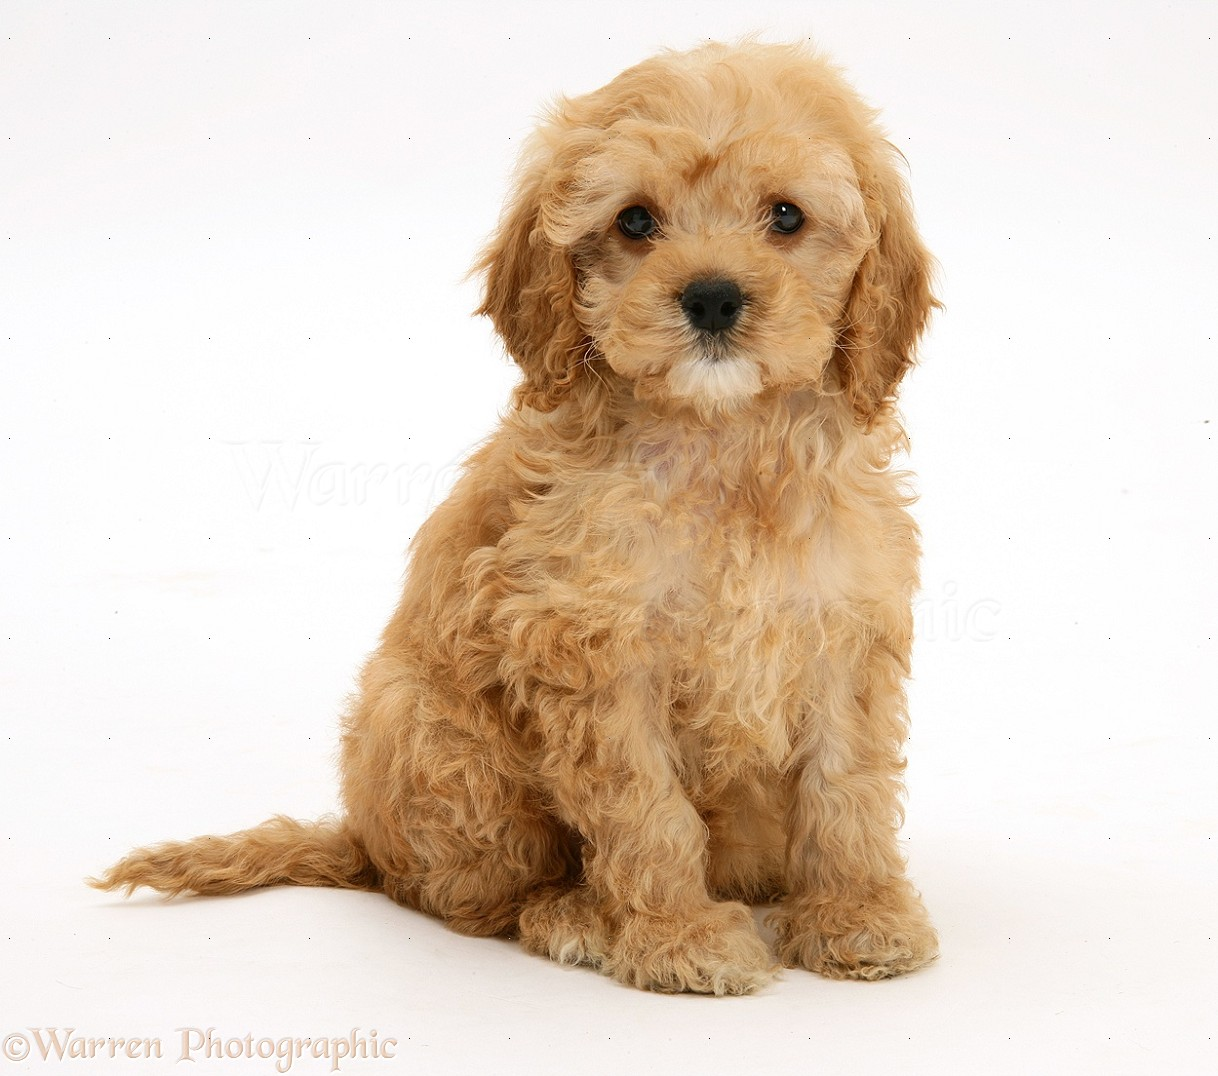 Dog American Cockapoo Puppy 8 Weeks Old Photo Wp17016